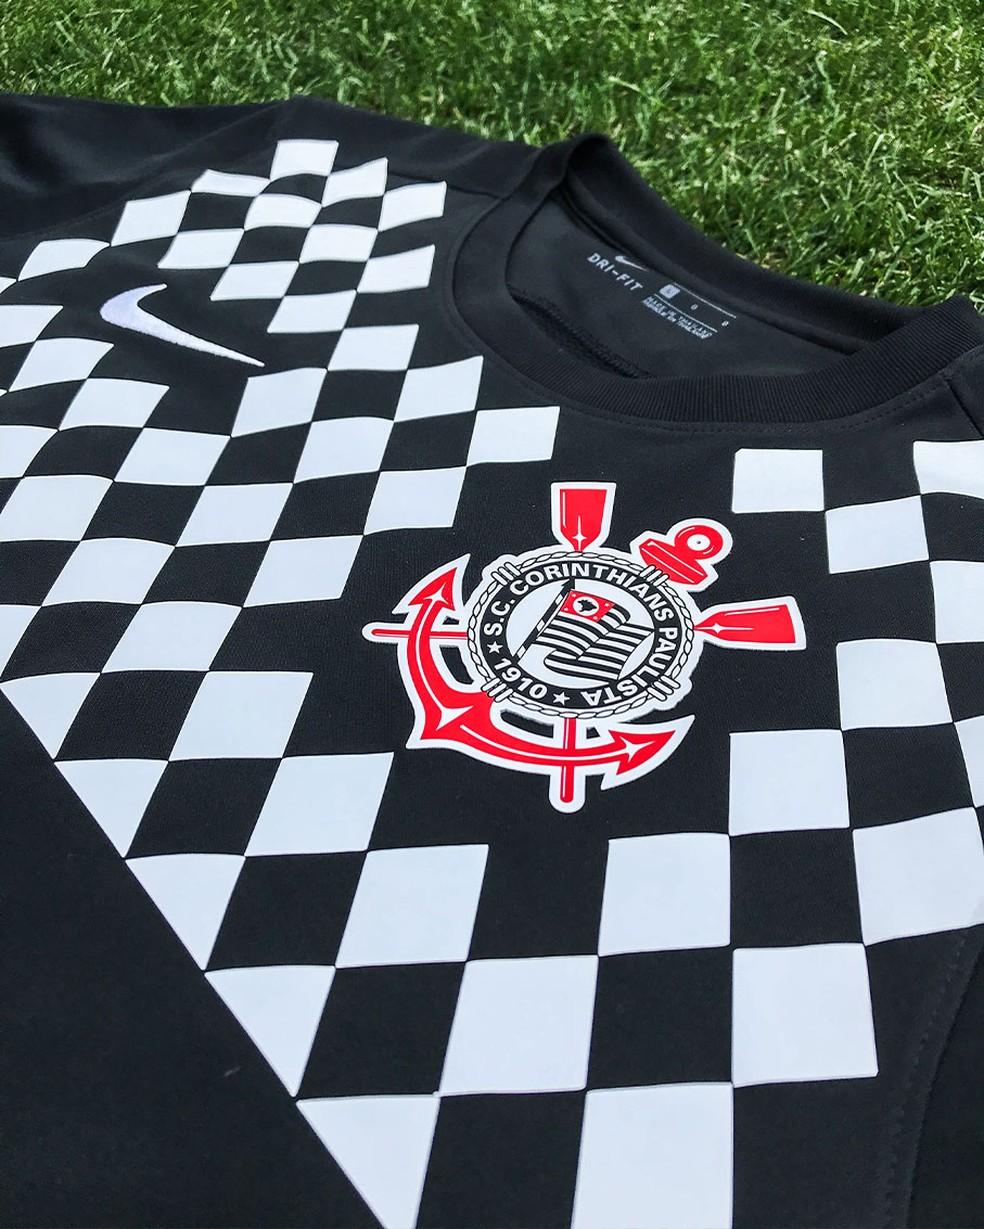 camisa do Corinthians 1990 Ronaldo Giovanelli Nike